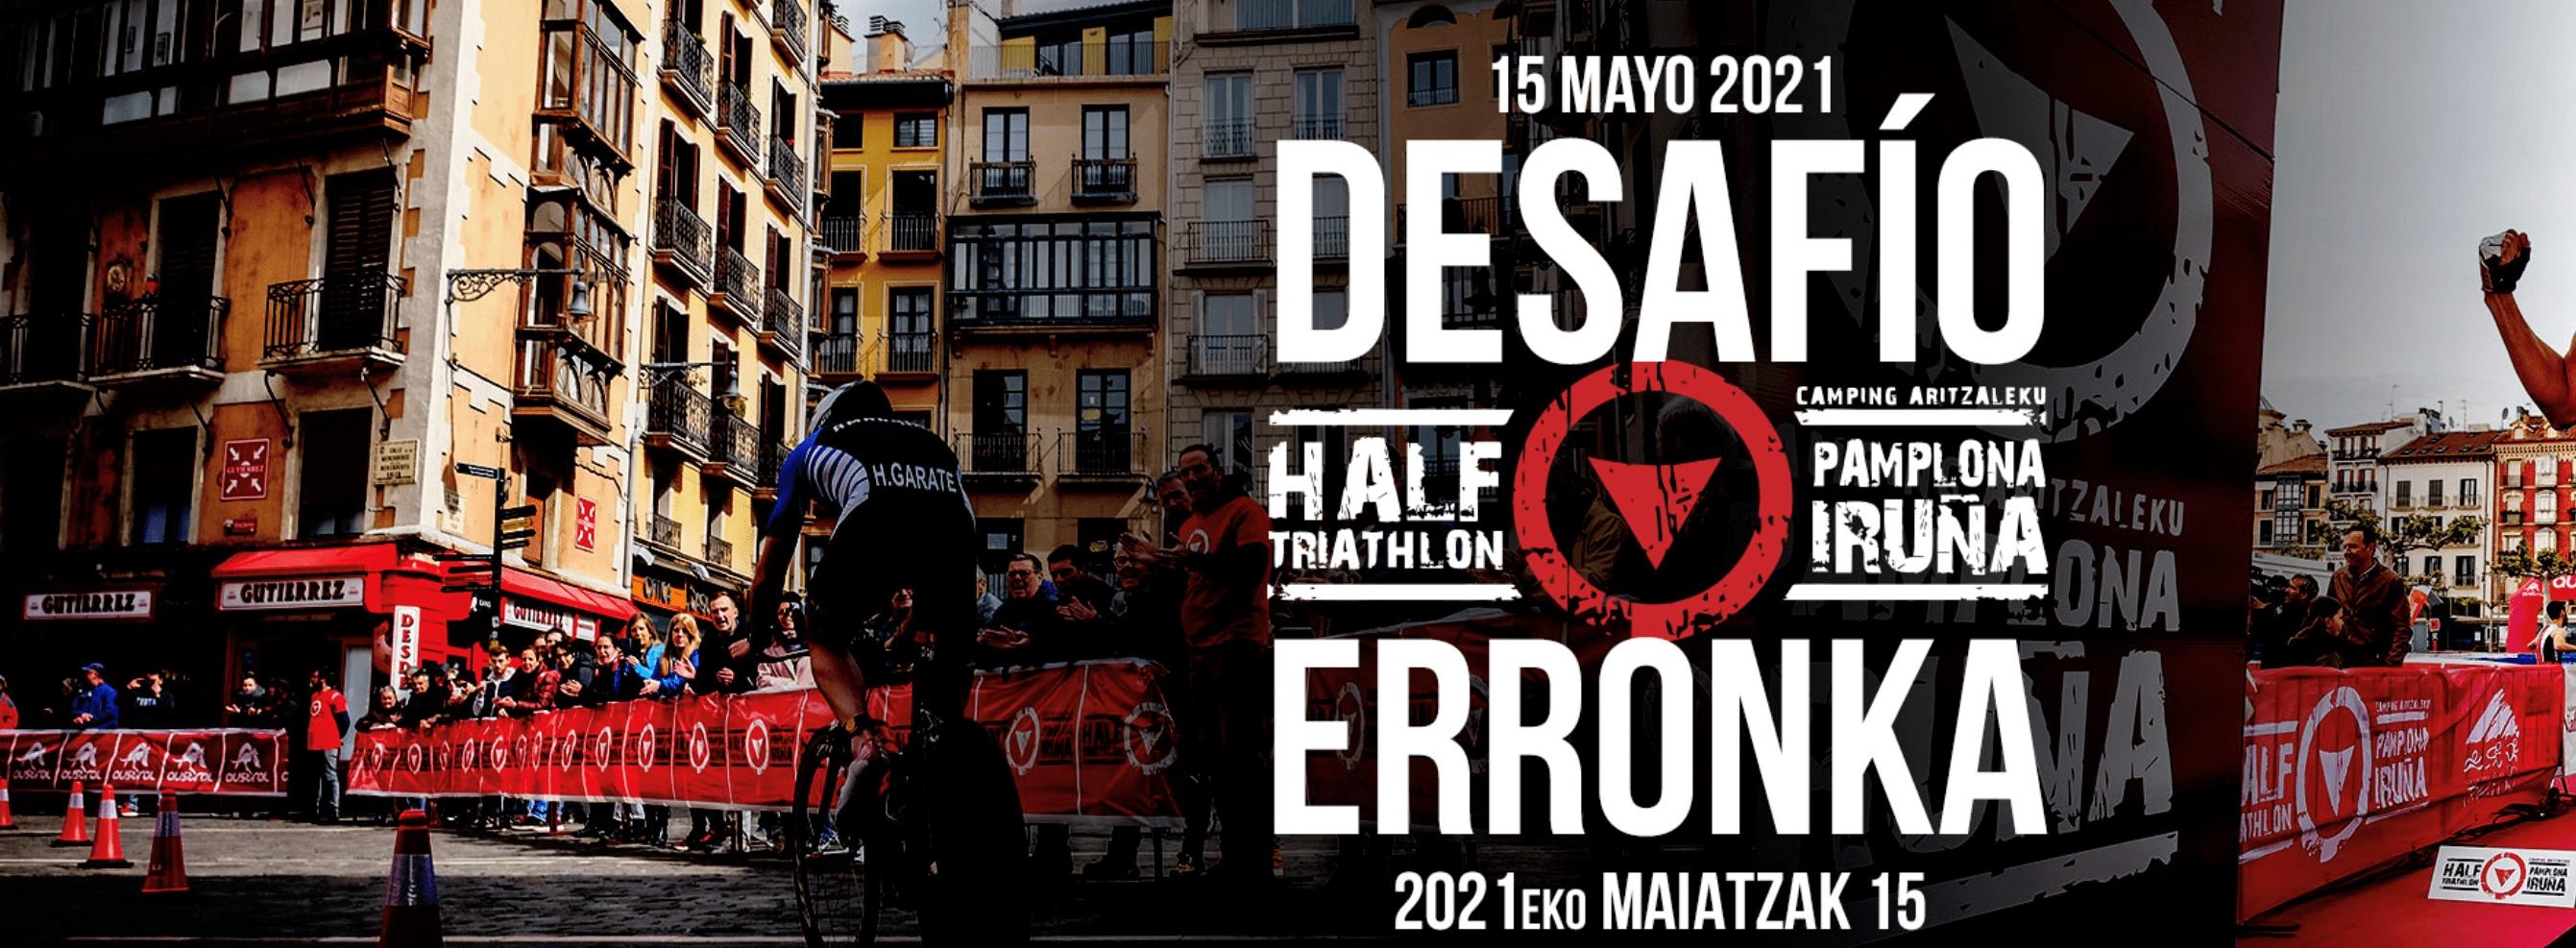 VI Half Triathlon Pamplona-Iruña 2021